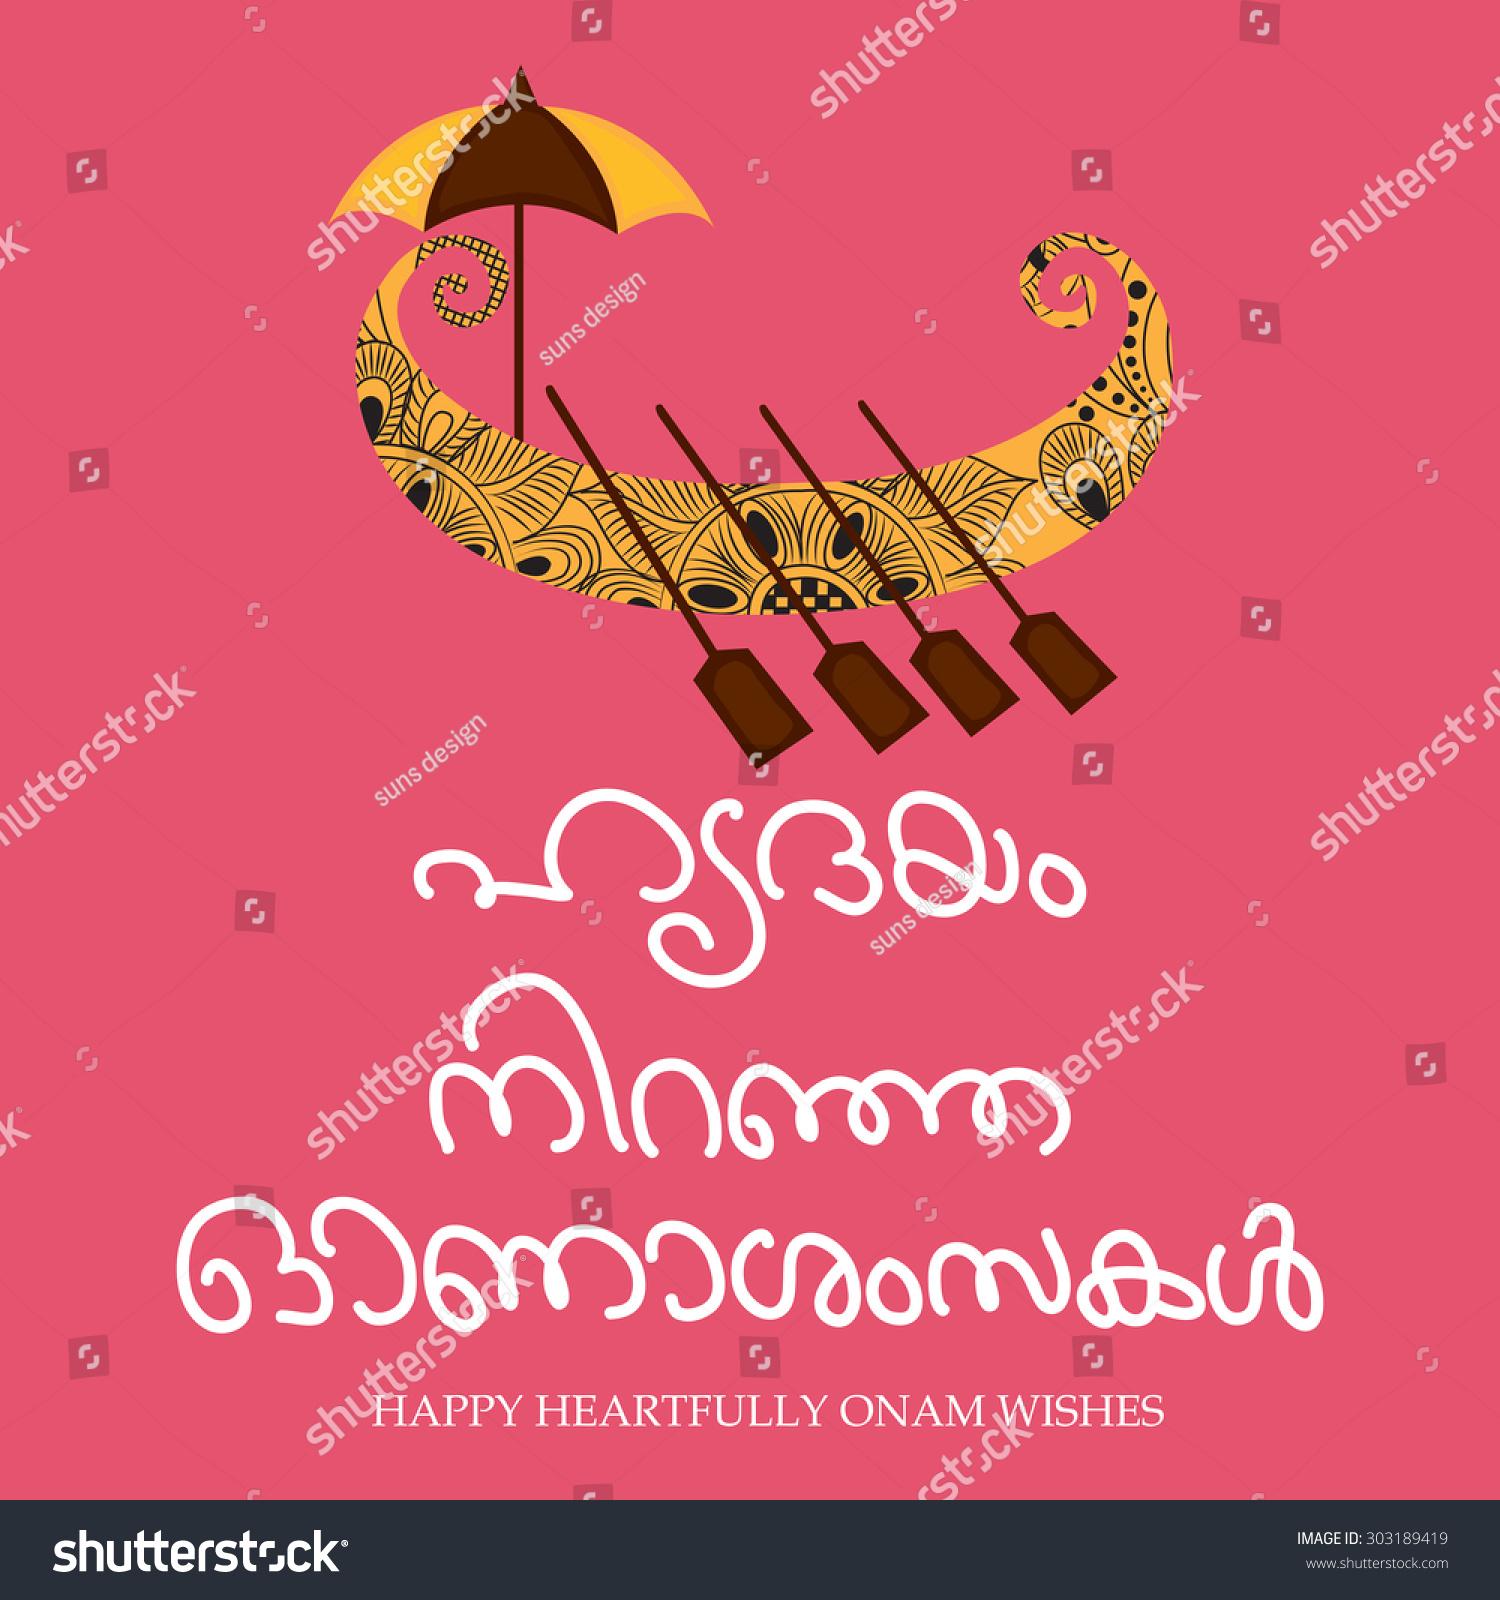 Vector Illustration Happy Heartfully Onam Wishes Stock Vector